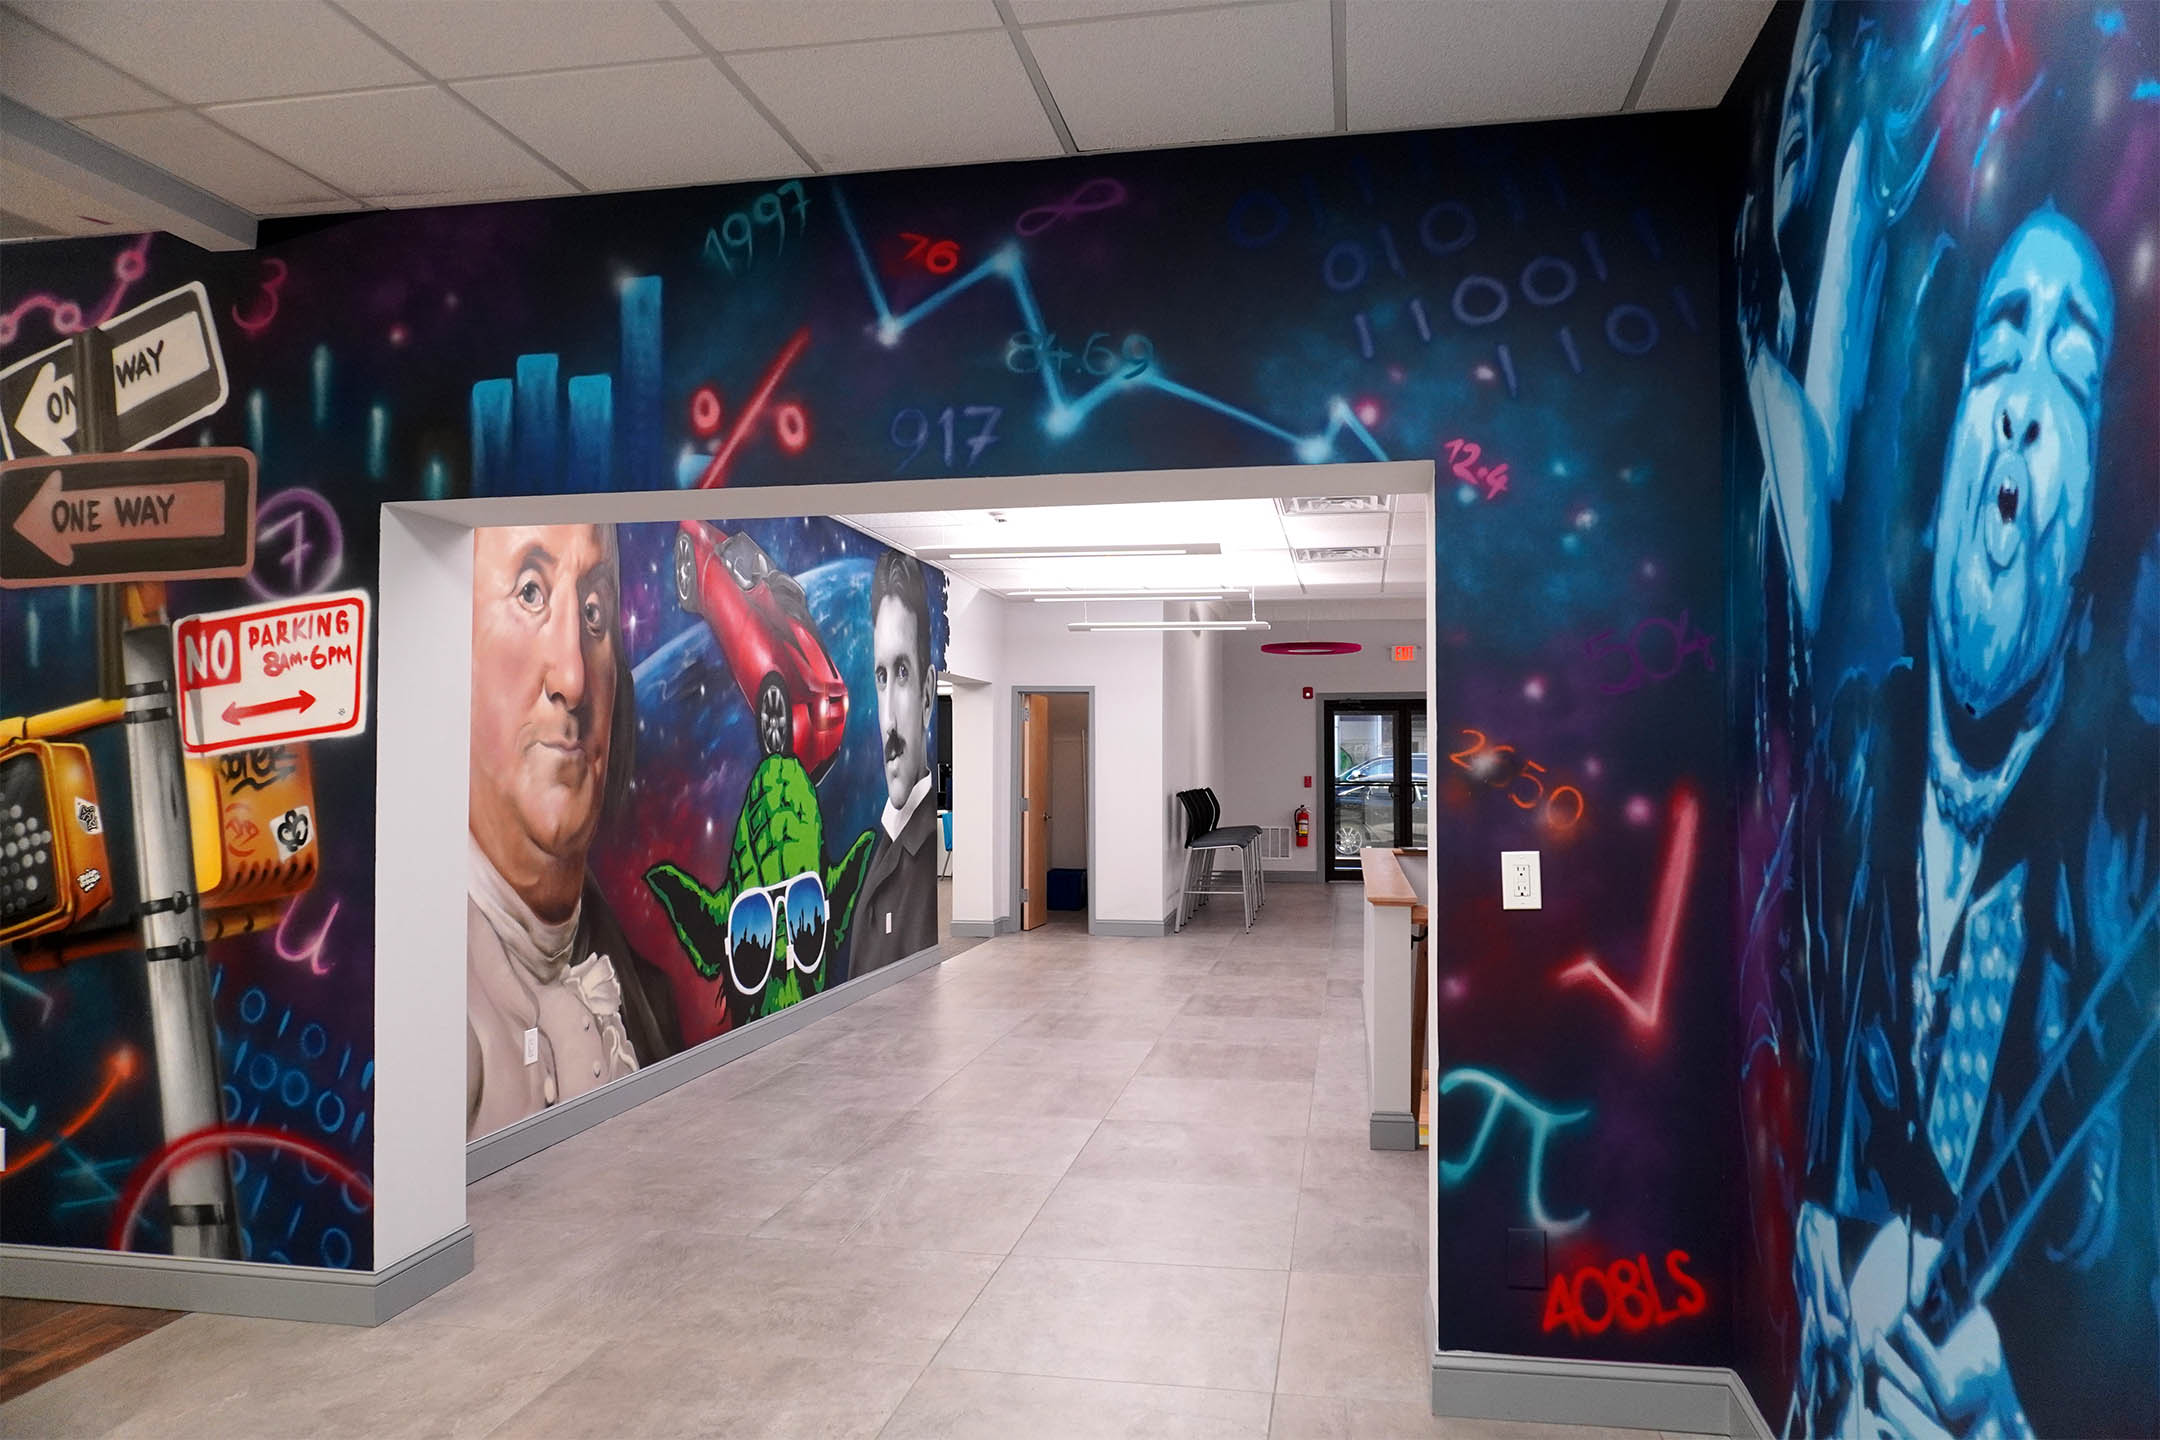 dripped-on-damien-mitchell-ls-direct-marketing-inovators-mural